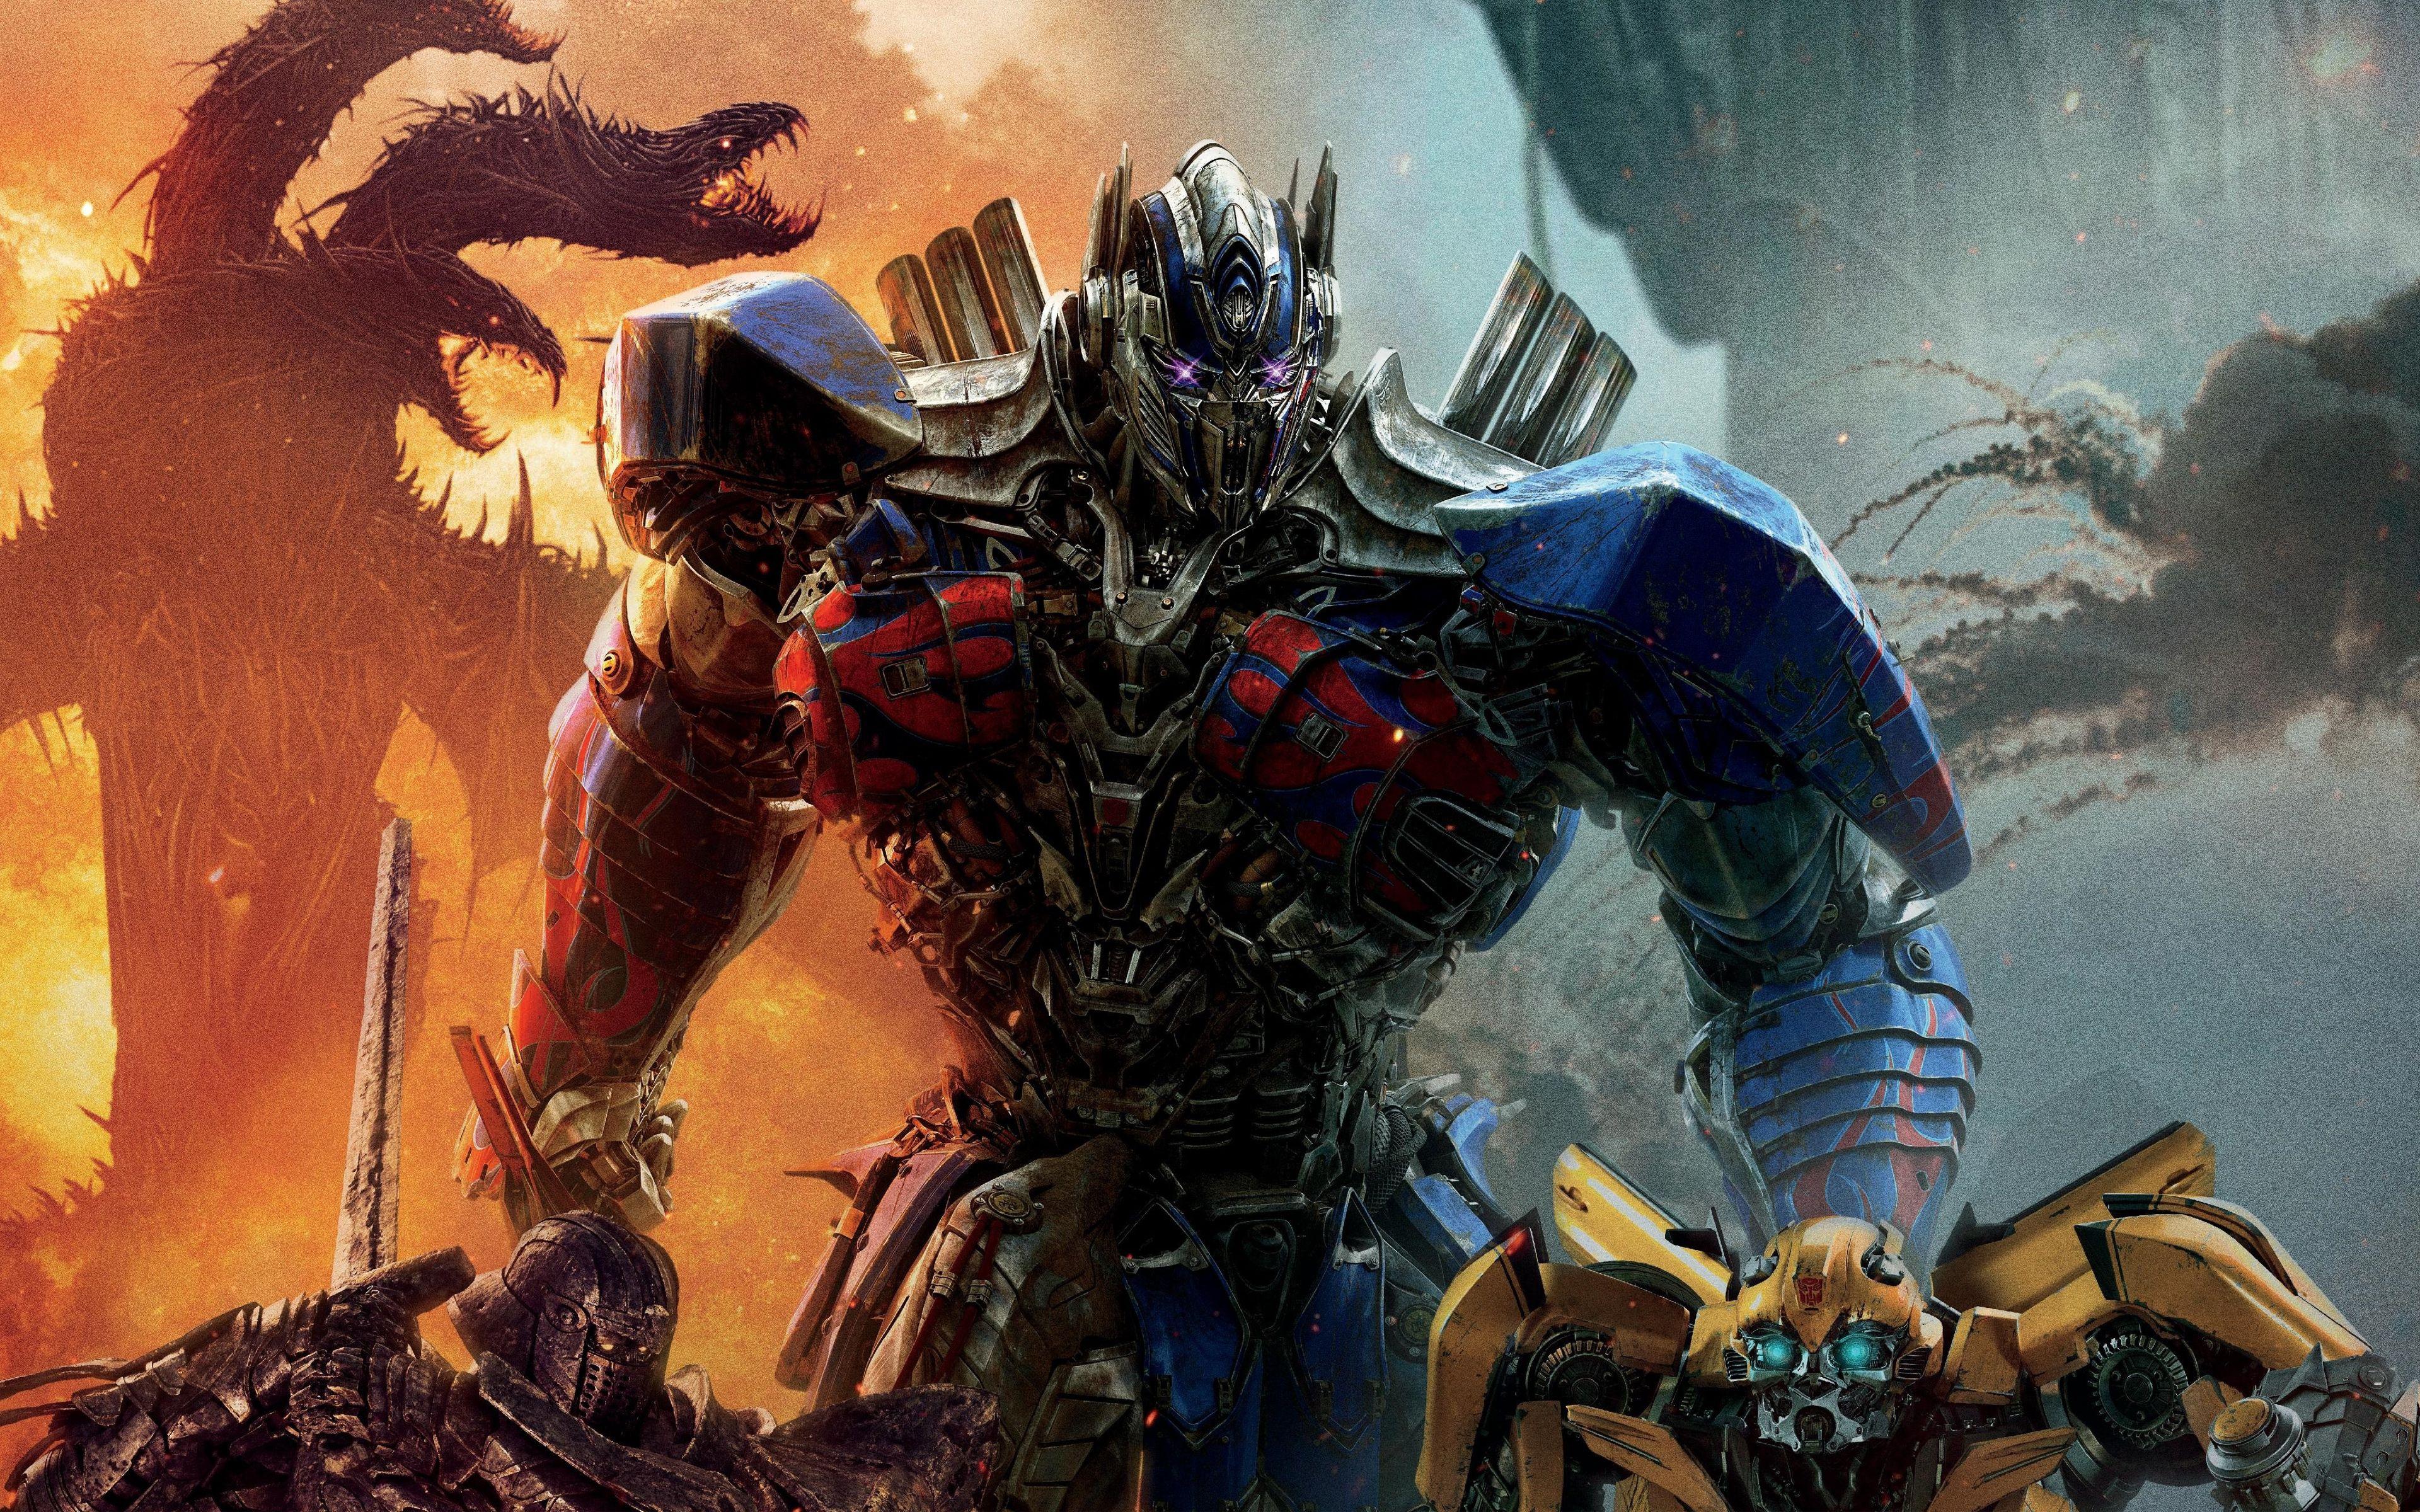 optimus_prime_transformers_the_last_knight_4k_2017wide